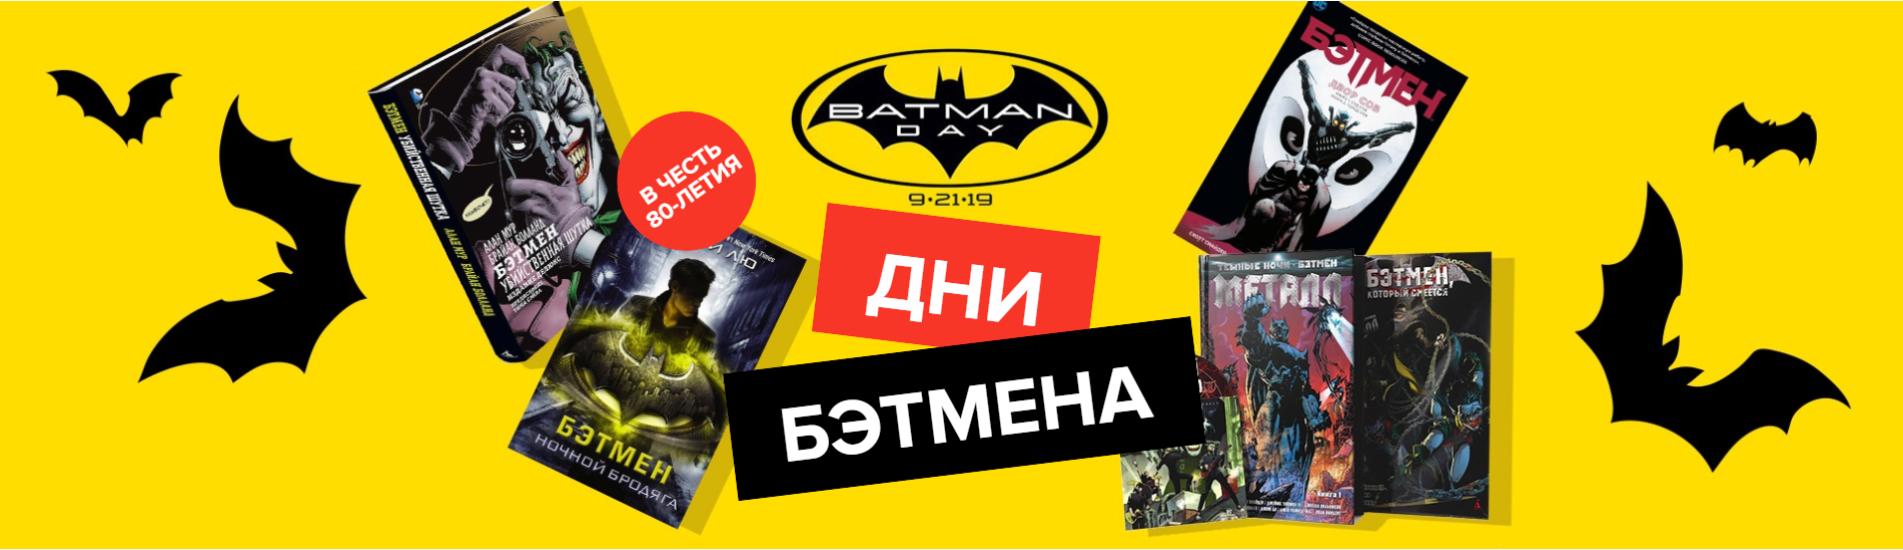 Дни Бэтмена